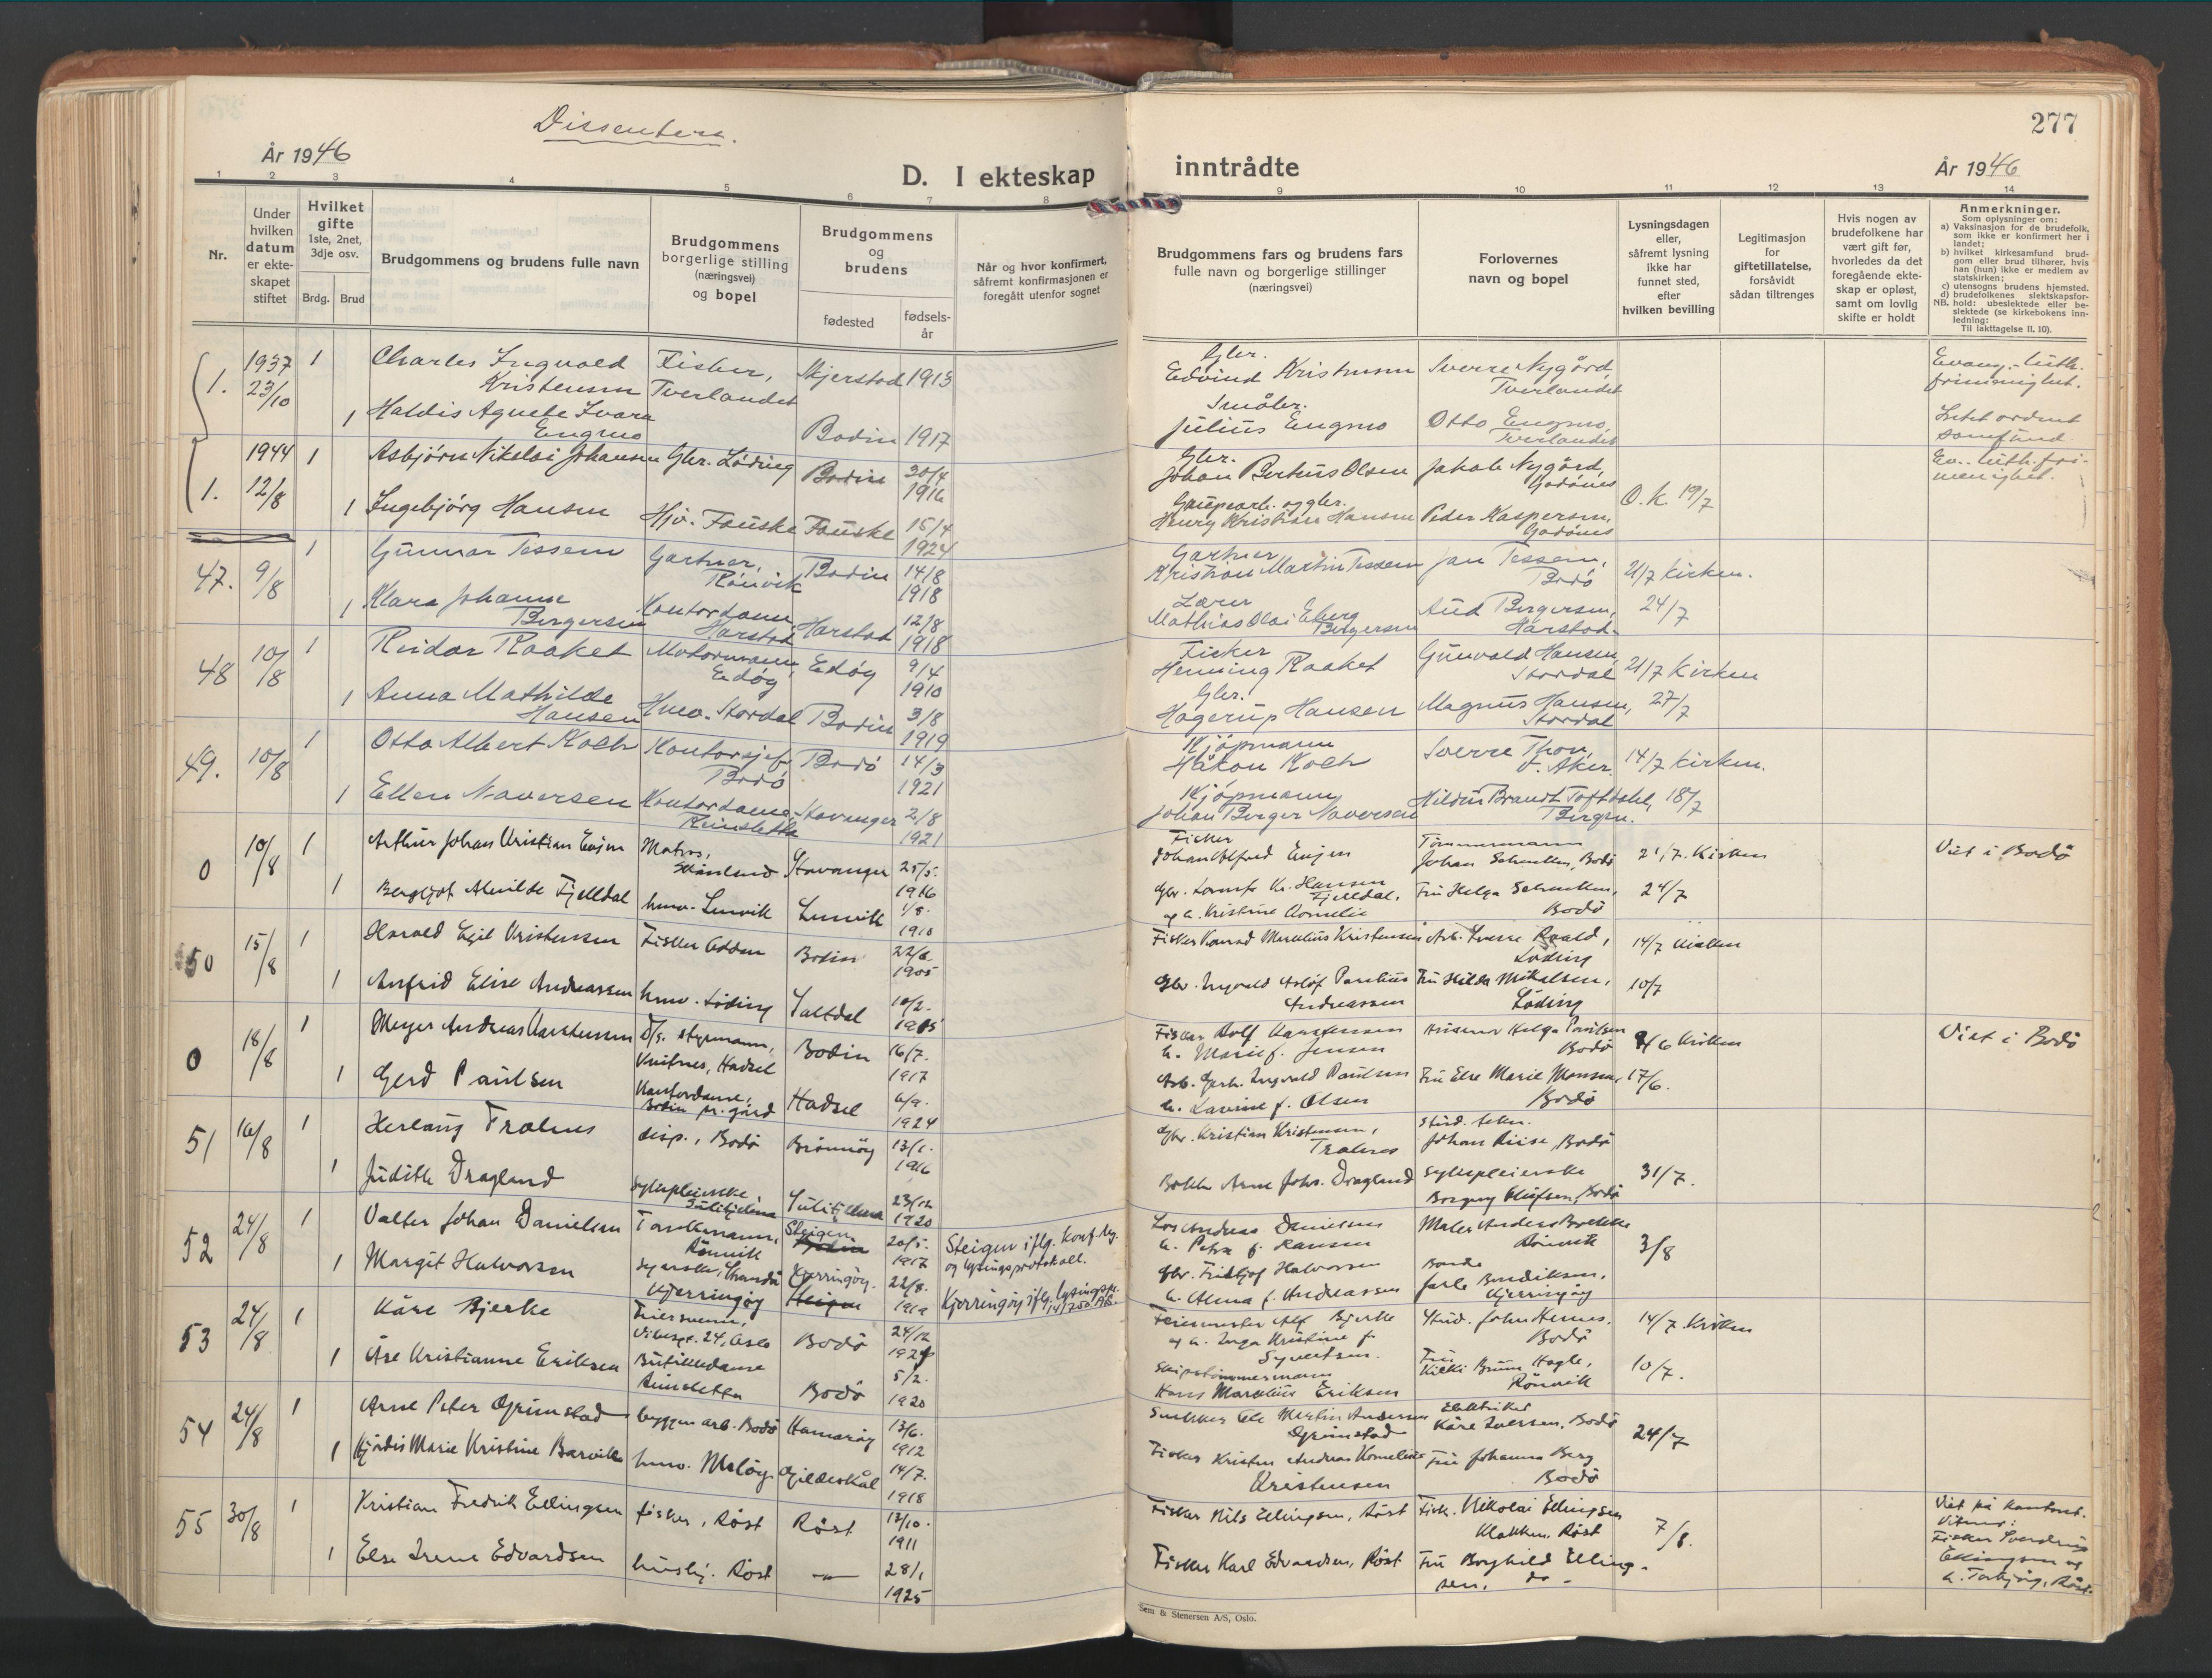 SAT, Ministerialprotokoller, klokkerbøker og fødselsregistre - Nordland, 802/L0061: Ministerialbok nr. 802A08, 1933-1946, s. 277